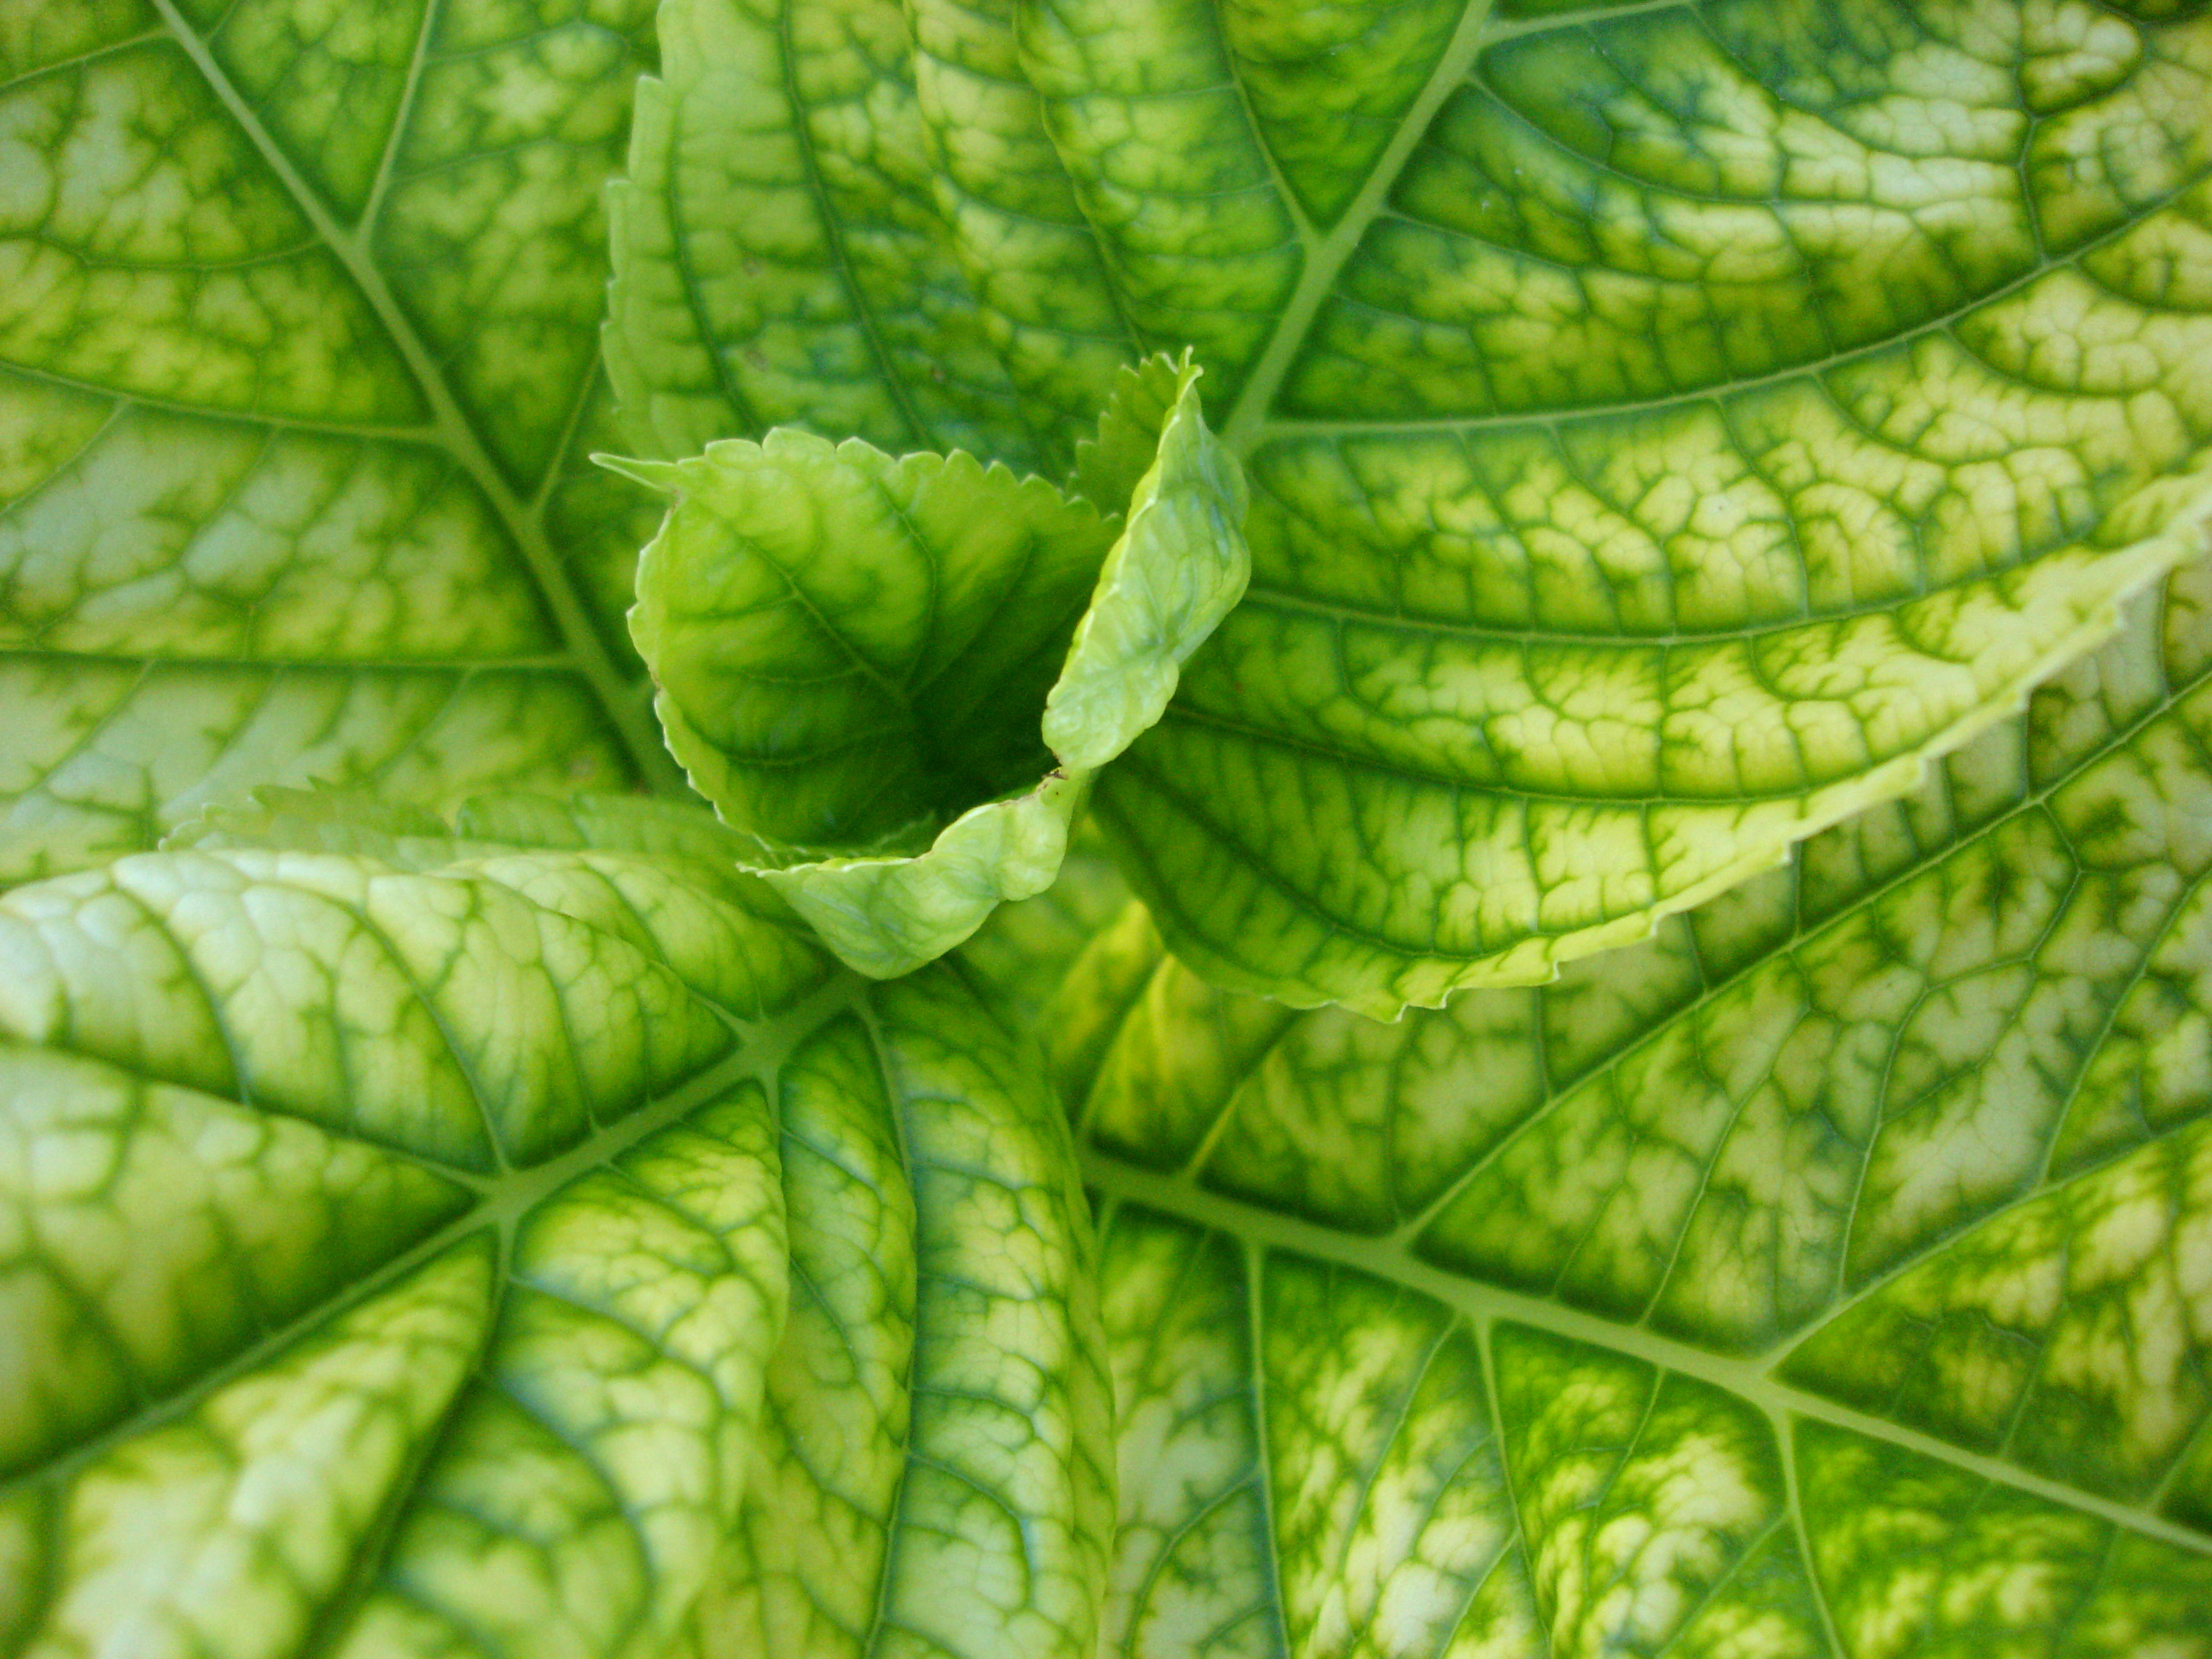 Carence ferrique sur feuille d'hortensia - © Florence Carreras - Inra